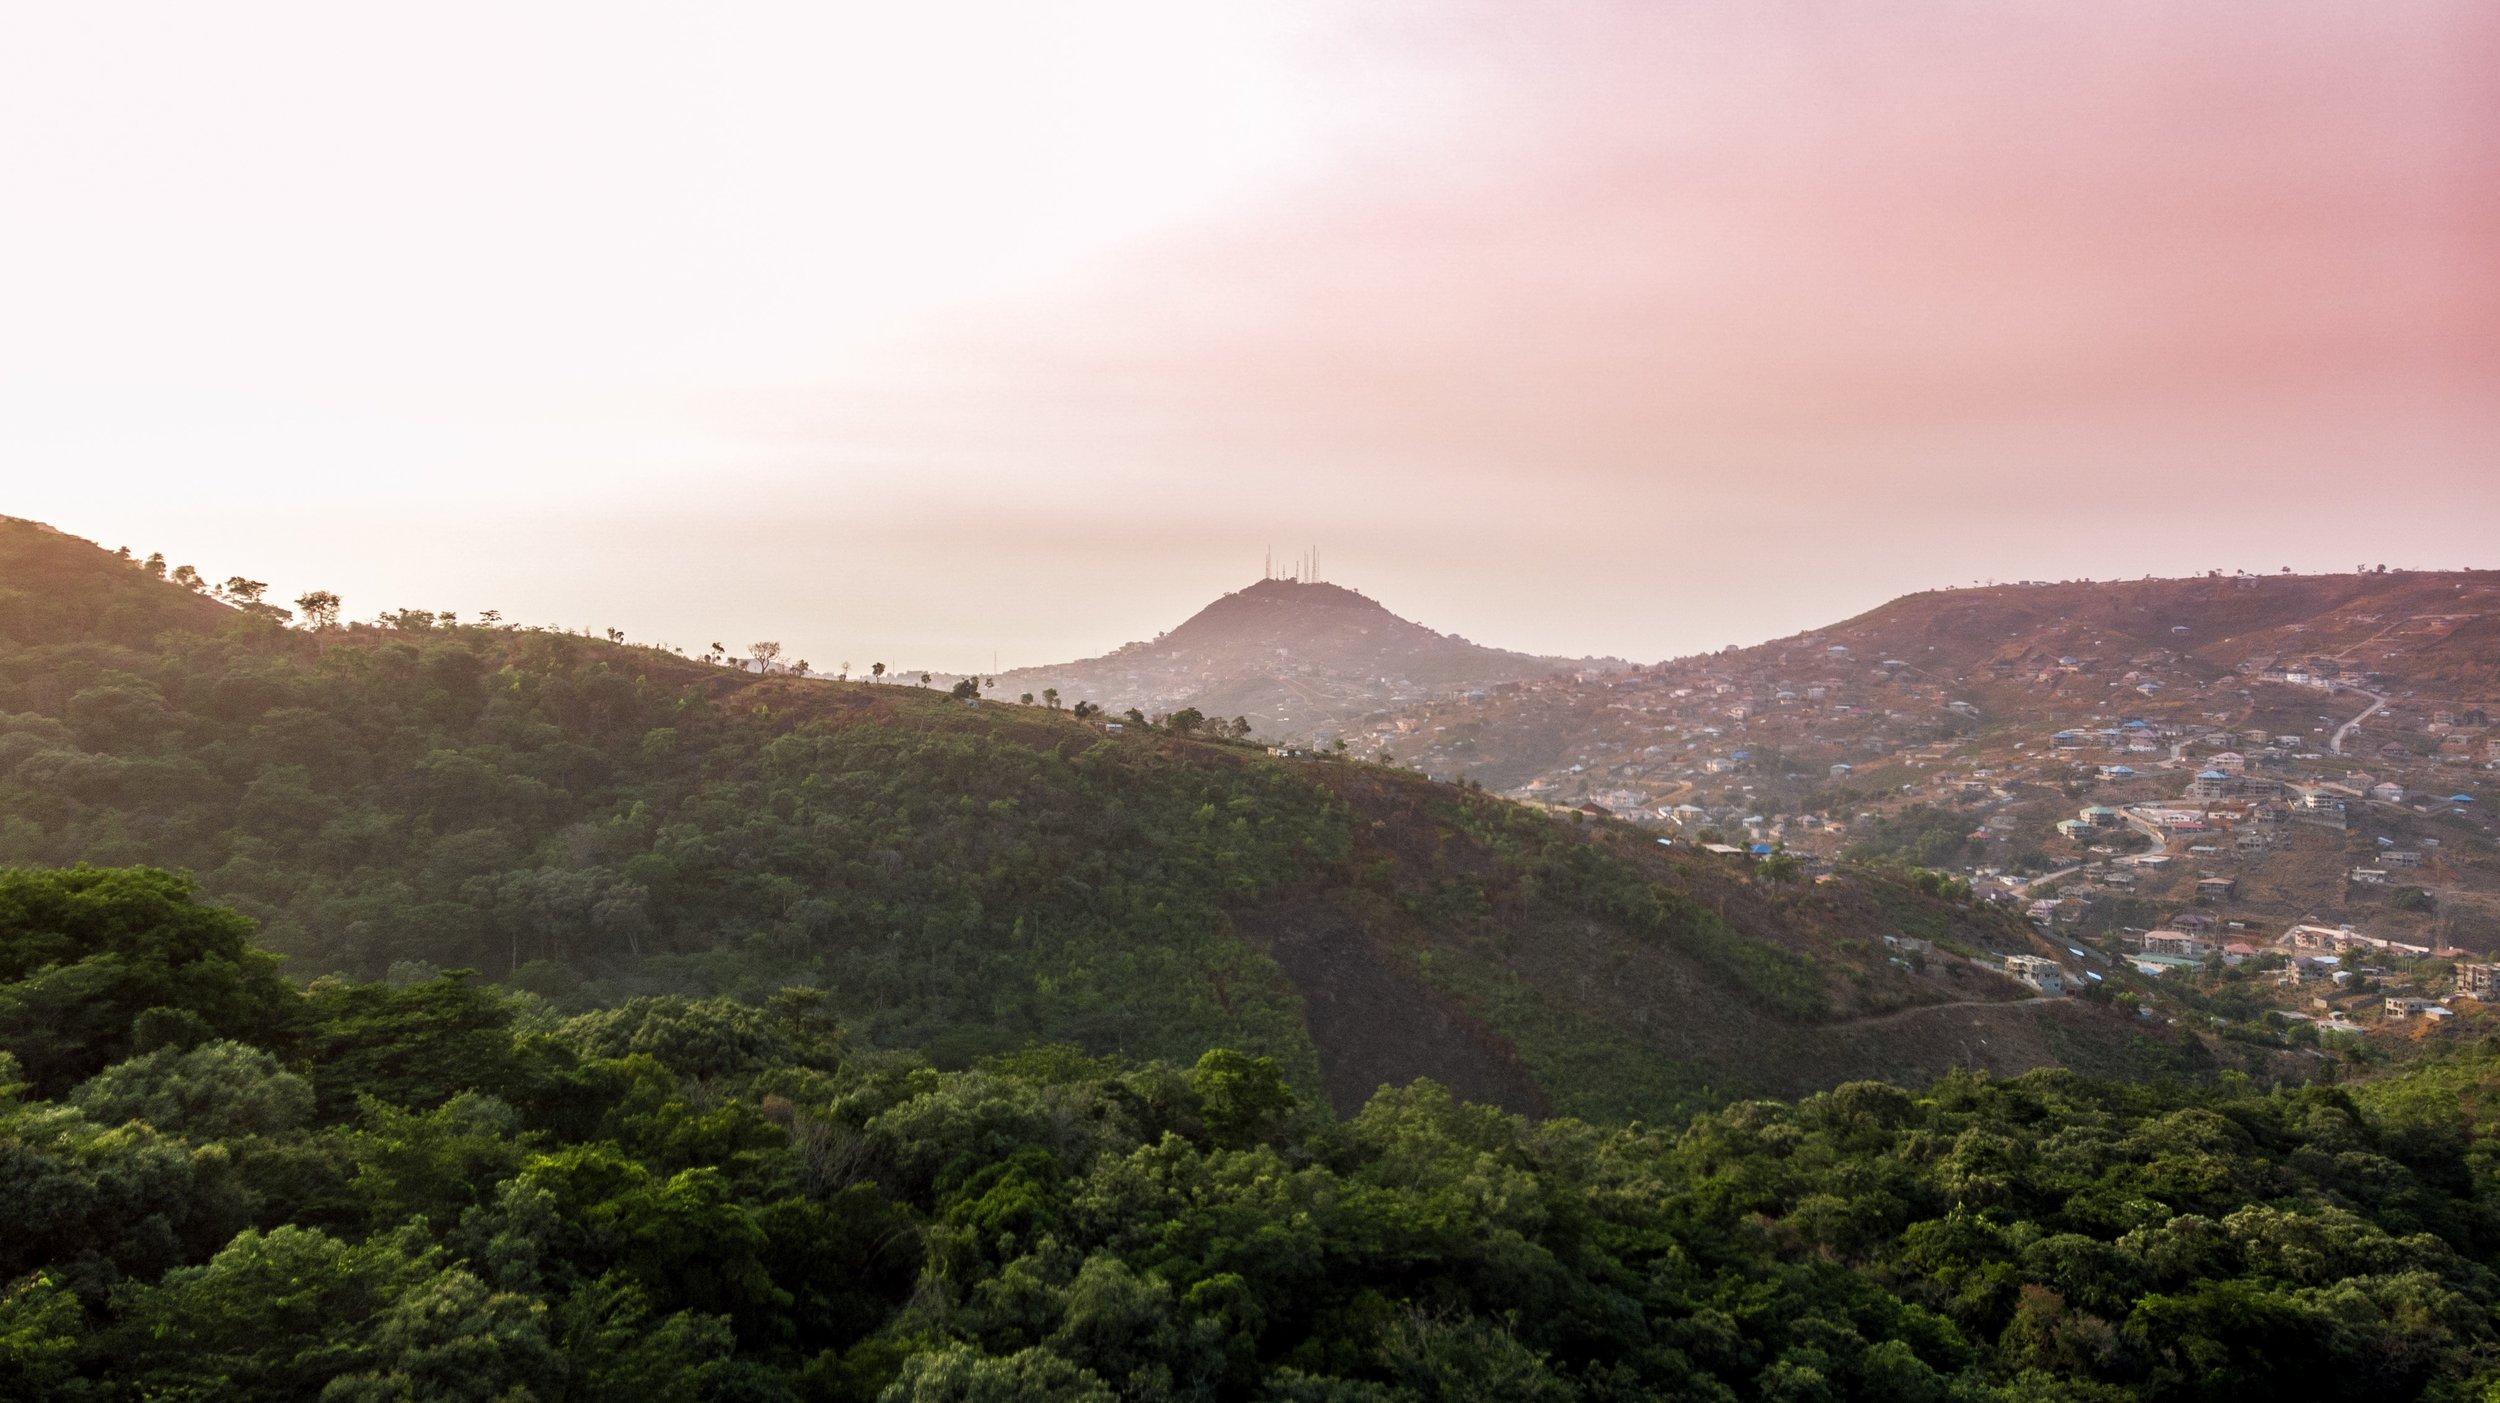 Sierraleone-vickieremoe-environment-rainforest-conservation-photos-radwanskeiky3.JPG